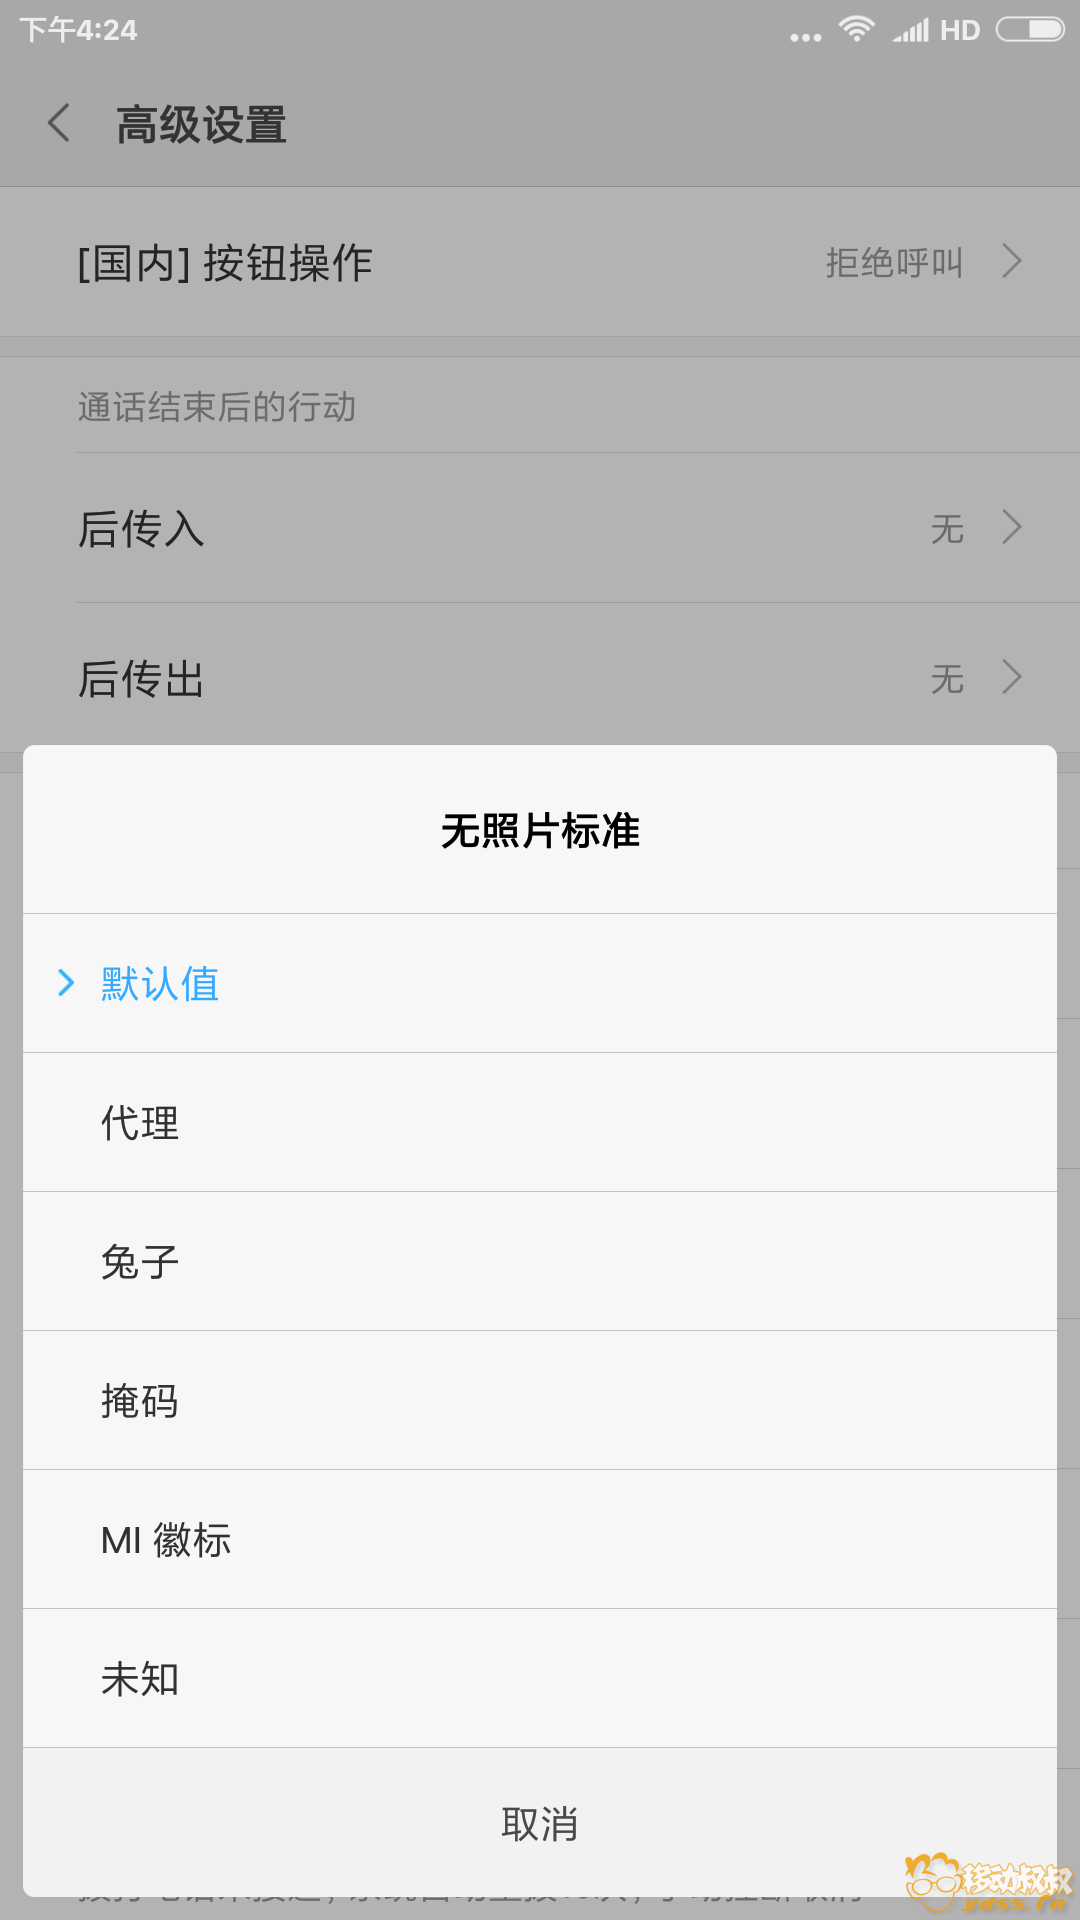 Screenshot_2018-05-19-16-24-56-009_com.android.phone.png